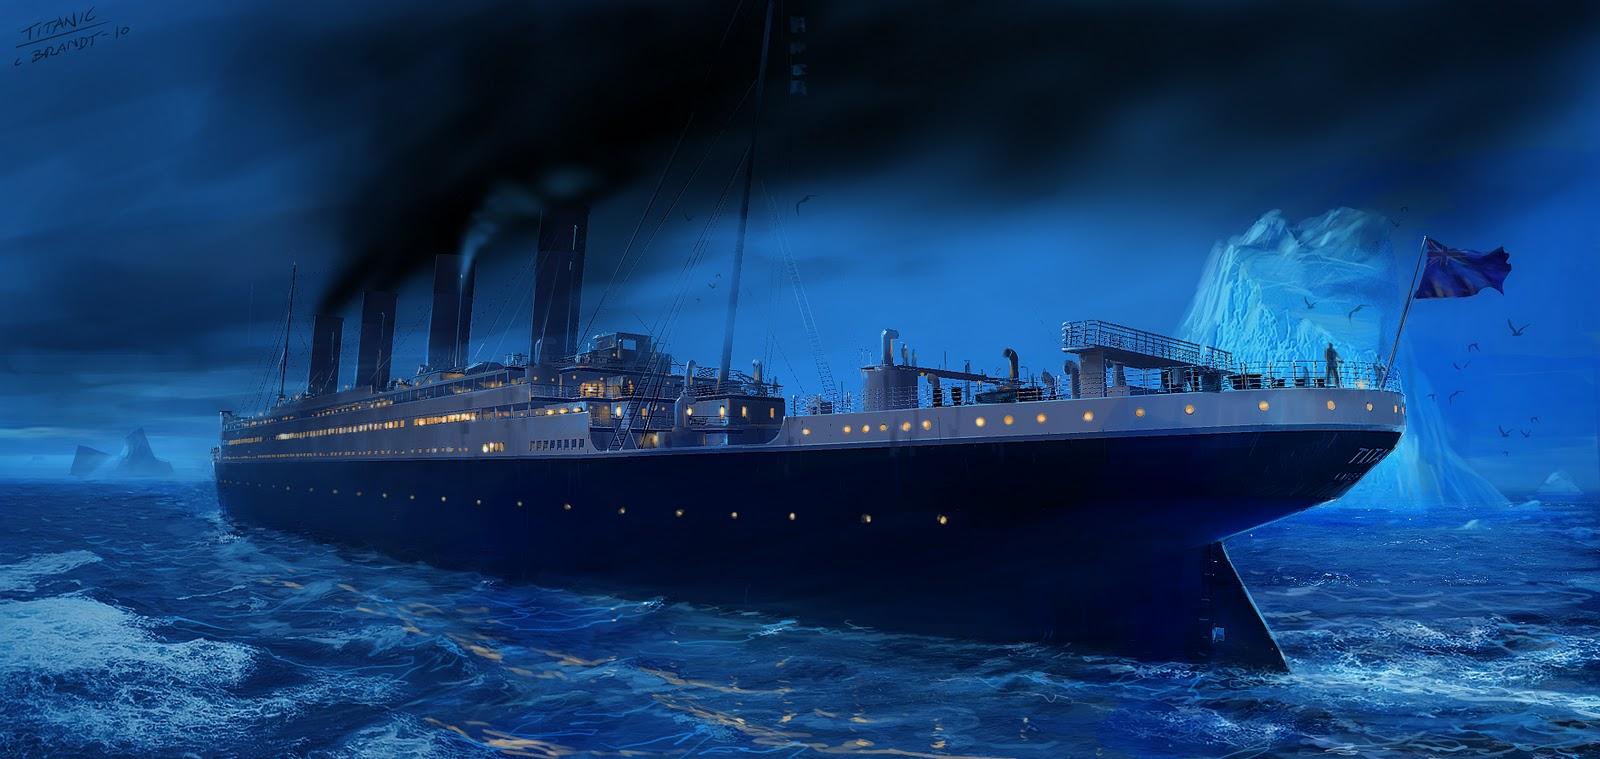 SkalleBlog: Titanic -